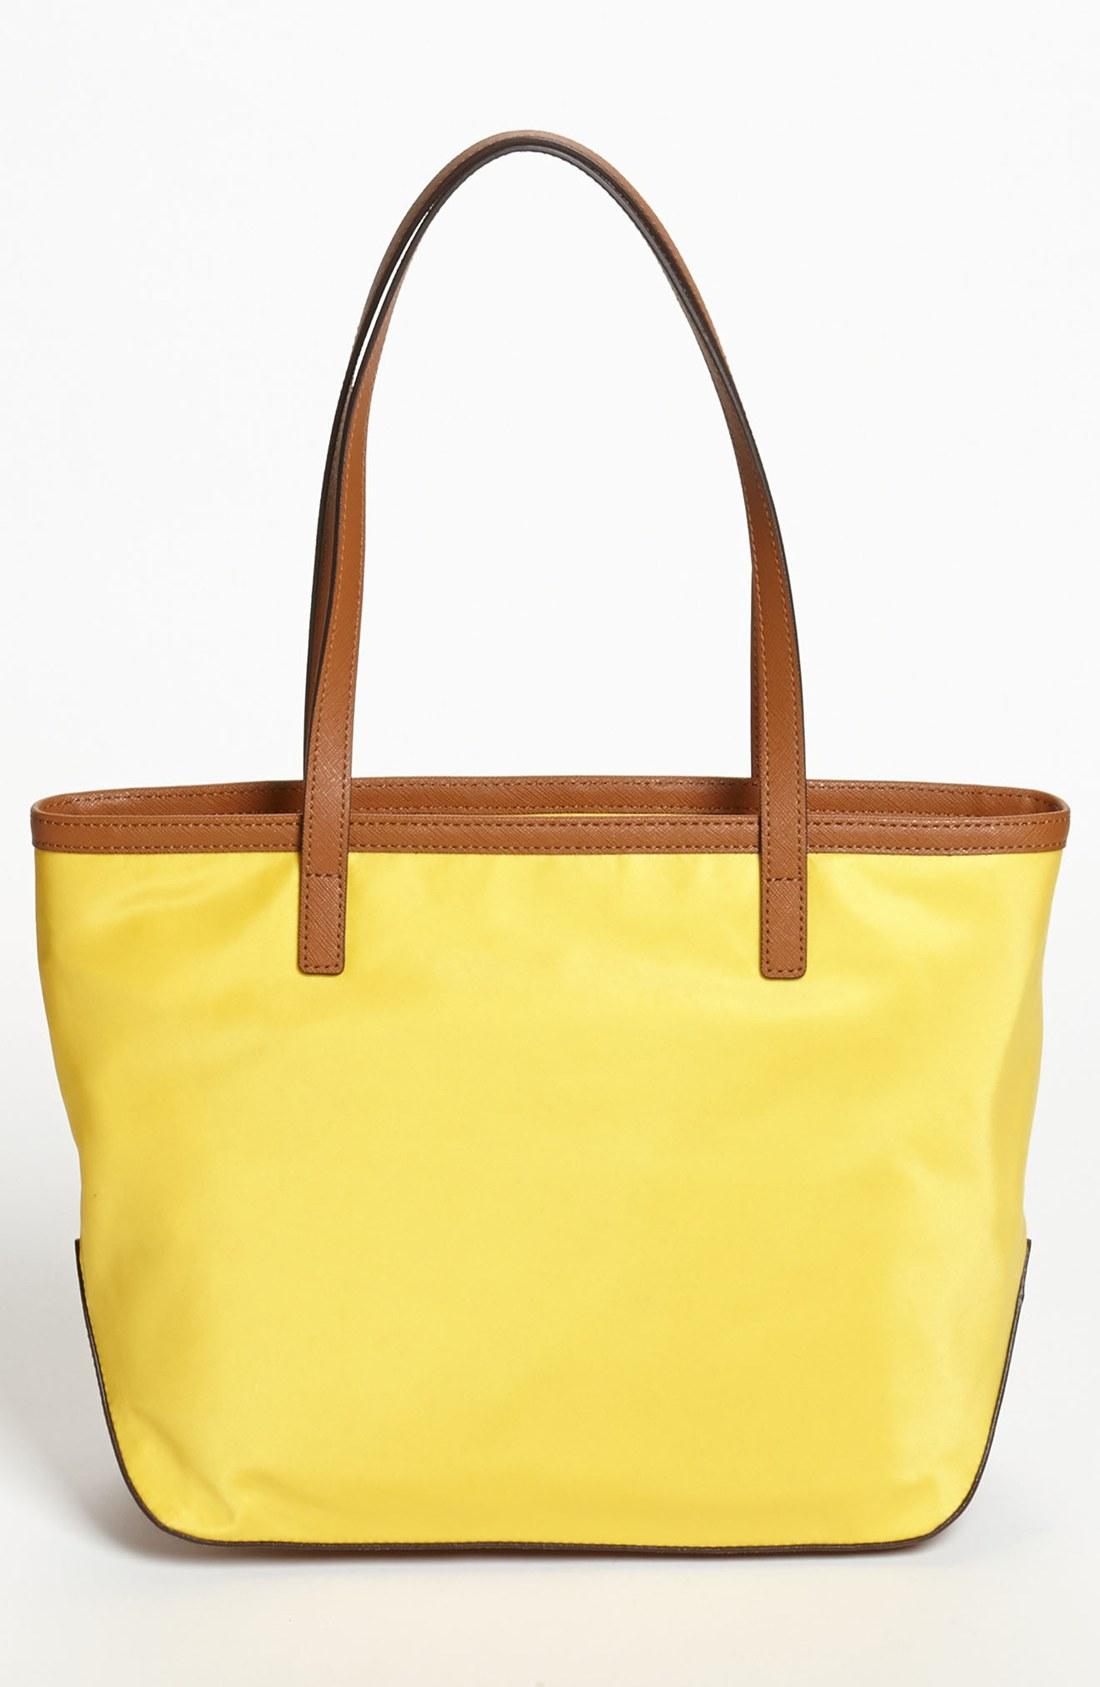 Bolsa Michael Kors Nylon : Michael kors kempton nylon tote in yellow lyst